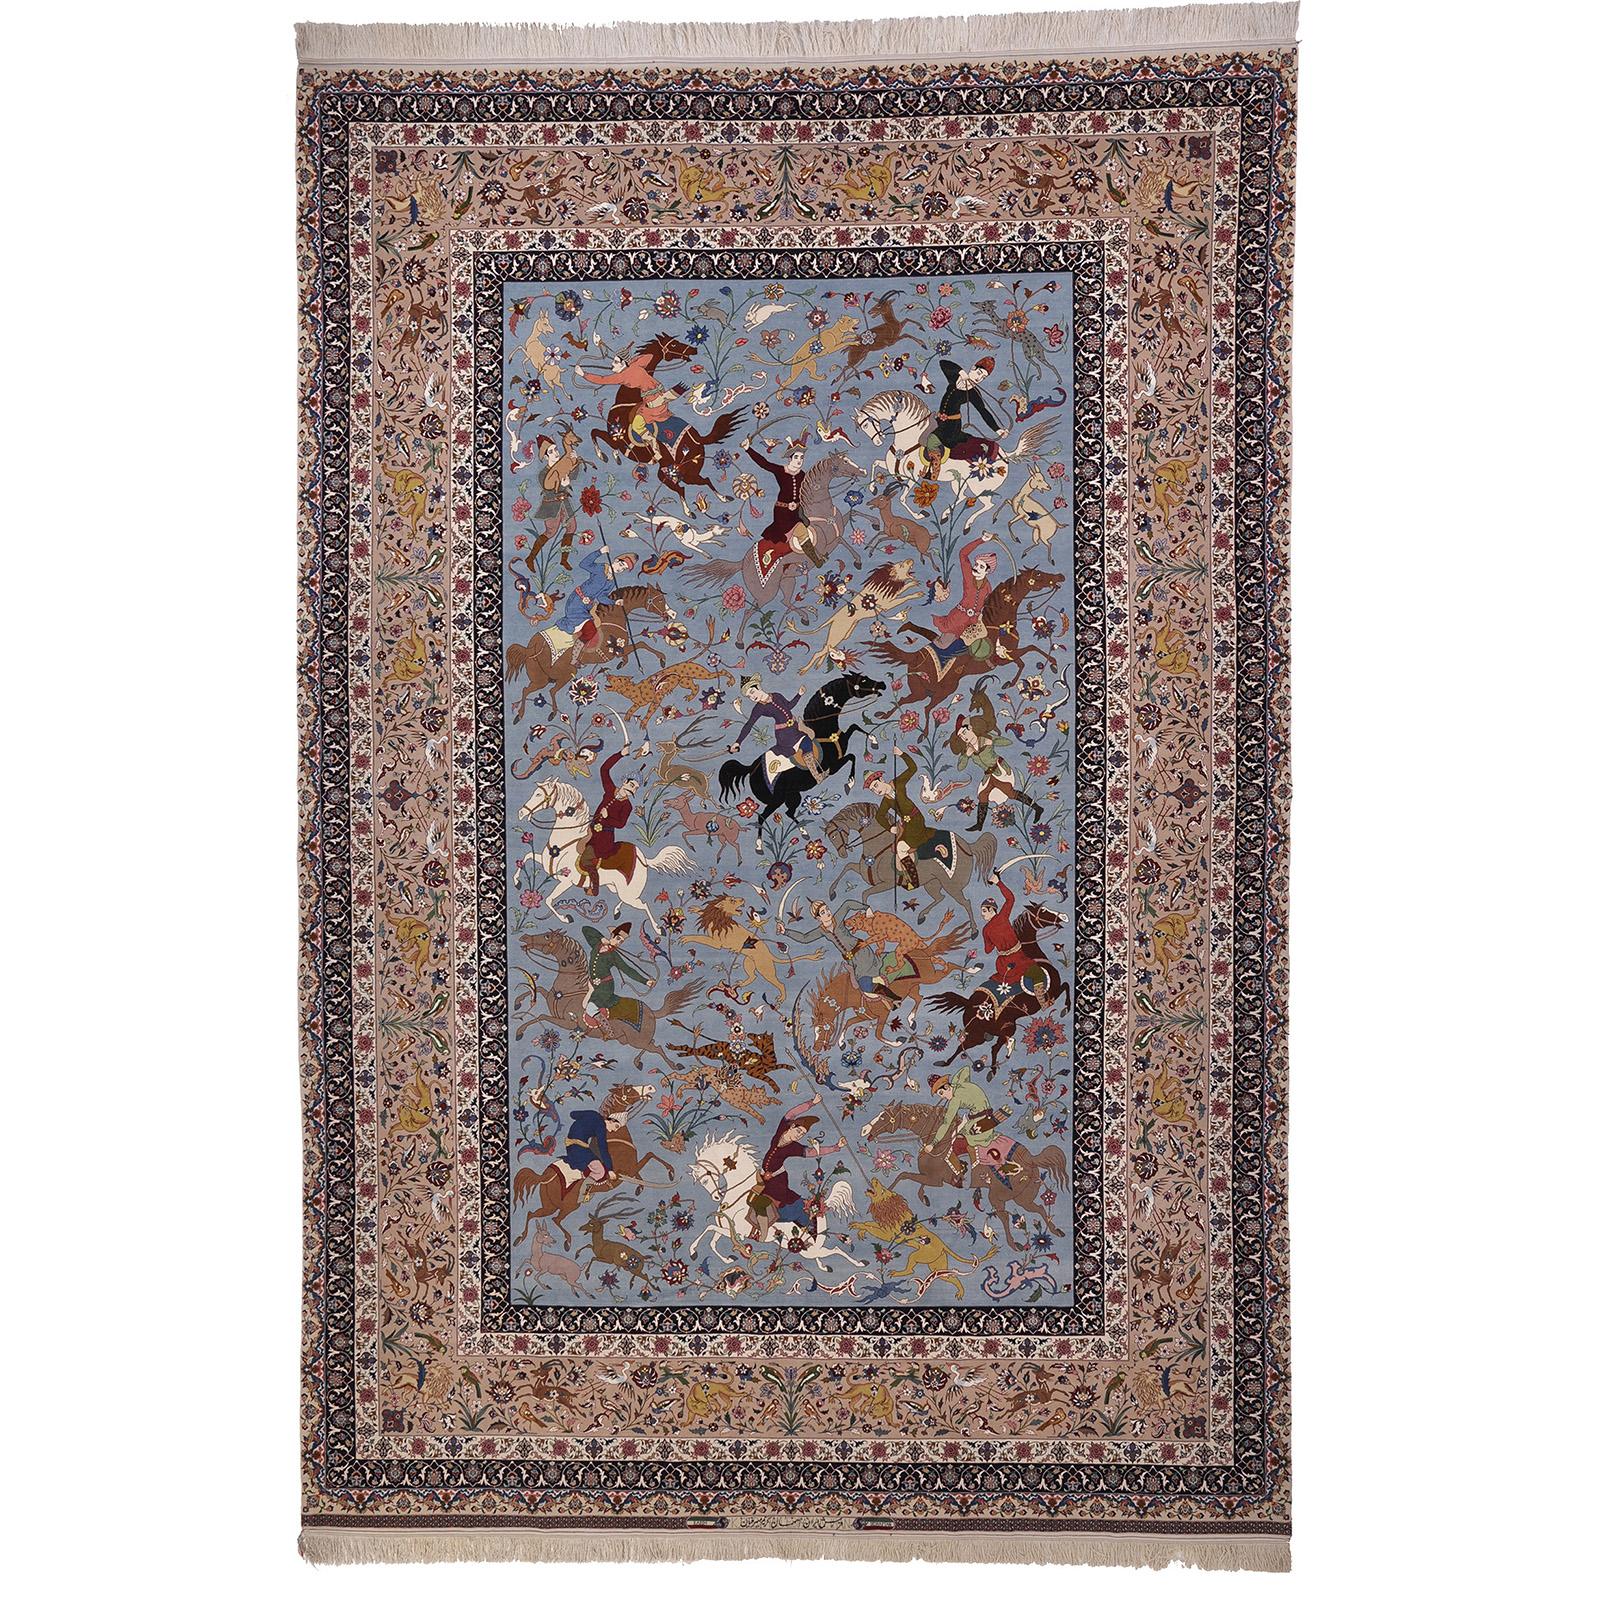 Esfahan (Kerim Seyrefian) 358xx242 cm-0